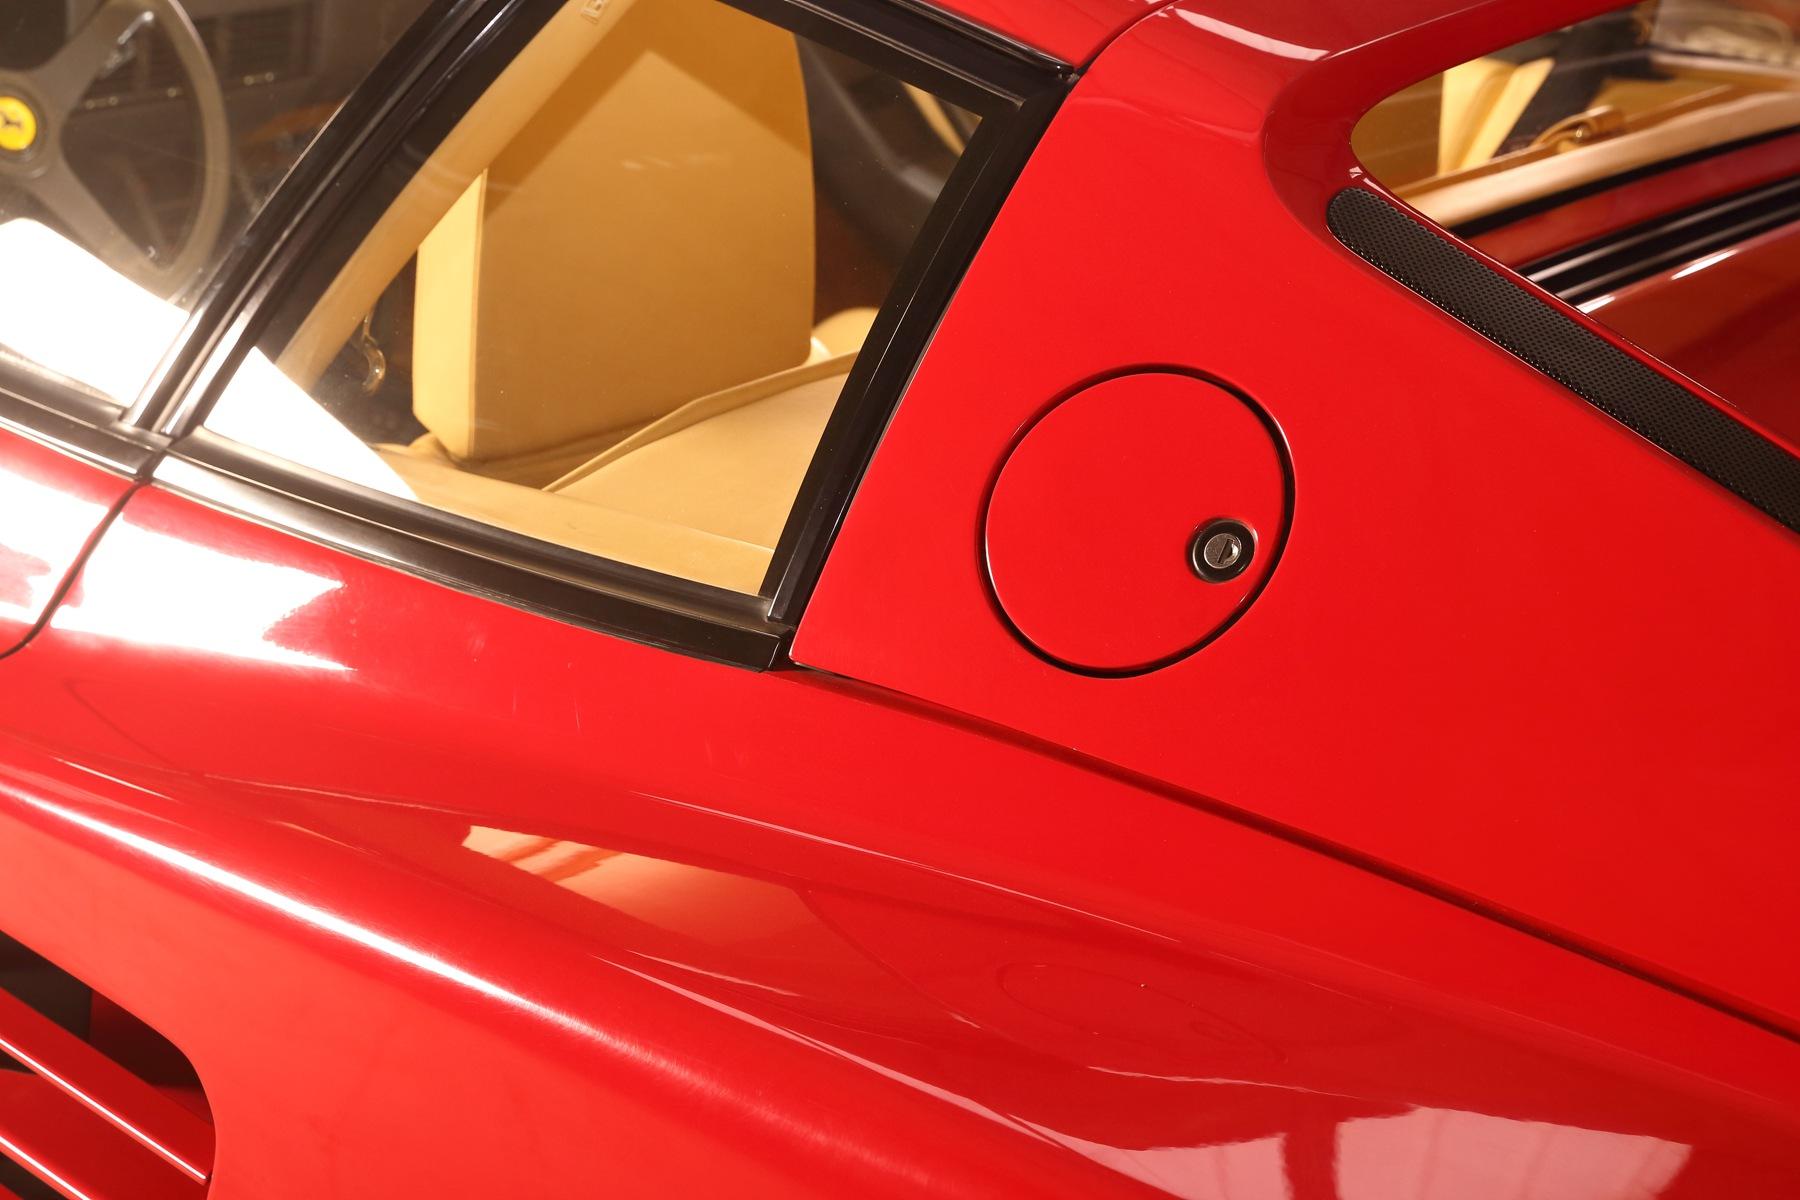 006 2016_03_16_Ferrari Testarossa I 038